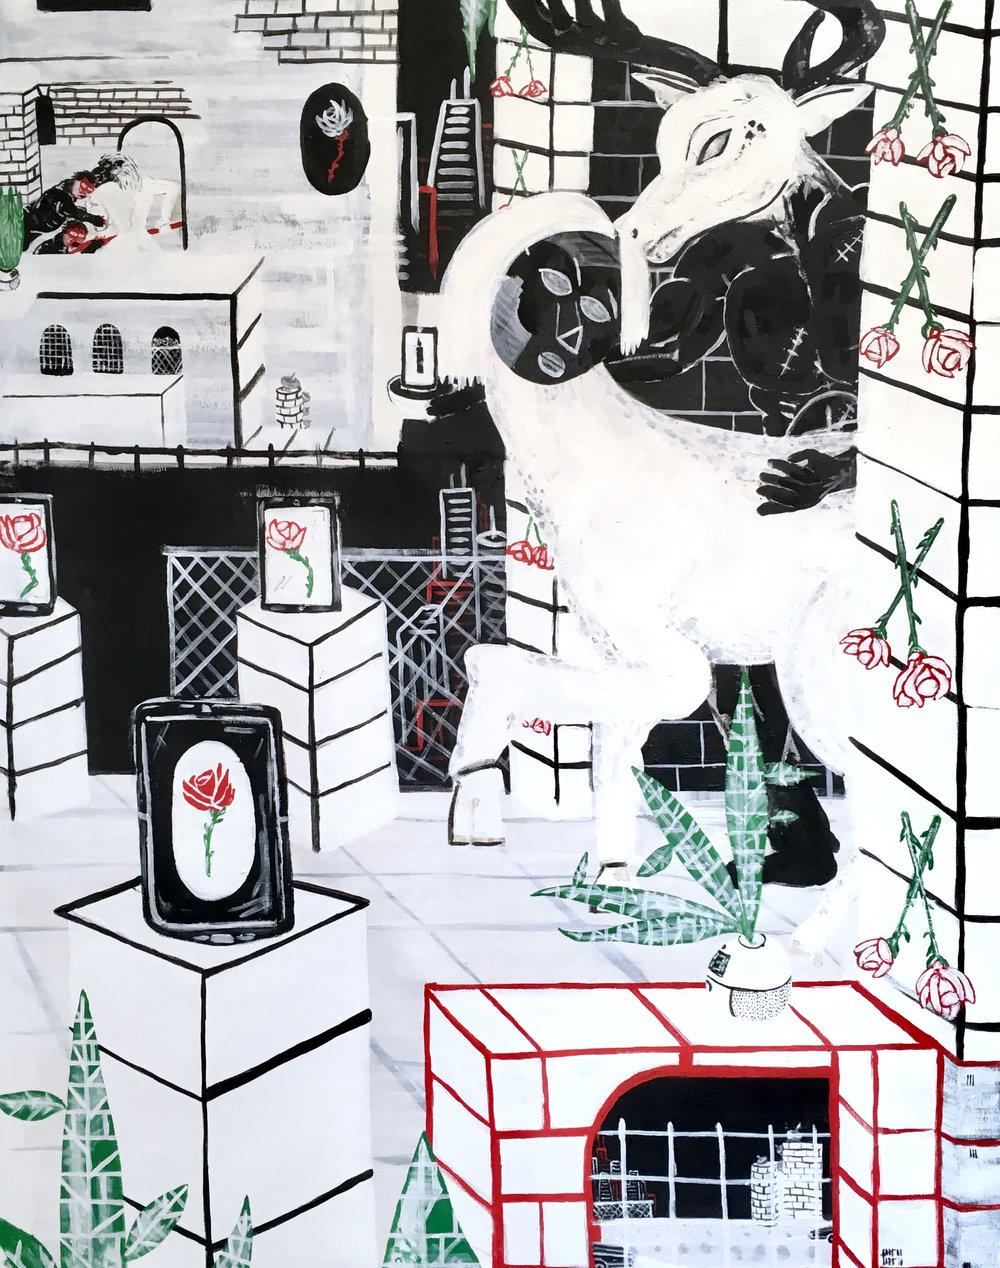 Kc Ortiz, Saturday Sept 17, 1994 (90x70), 2018.